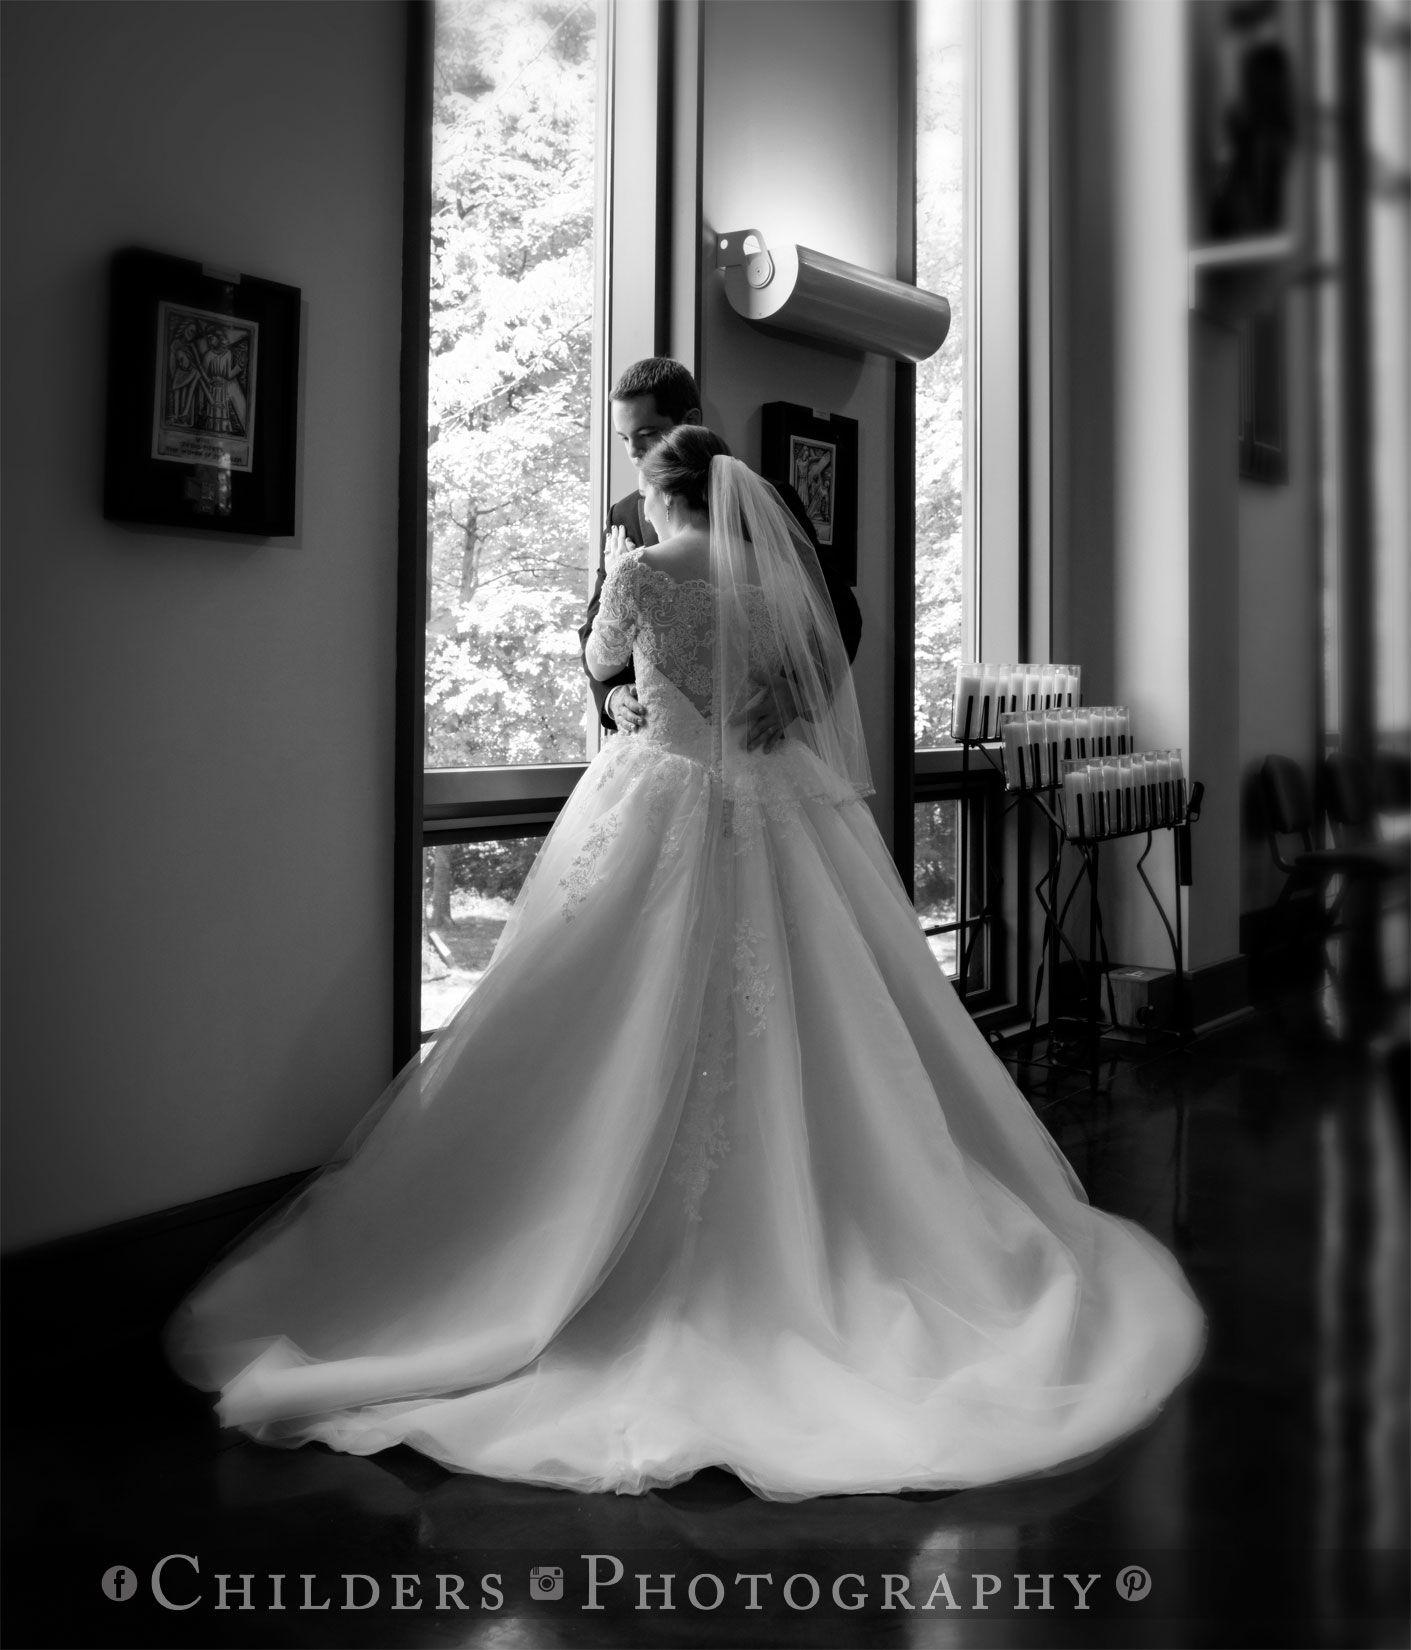 Wedding, Wedding Photography, Bride And Groom, Portrait